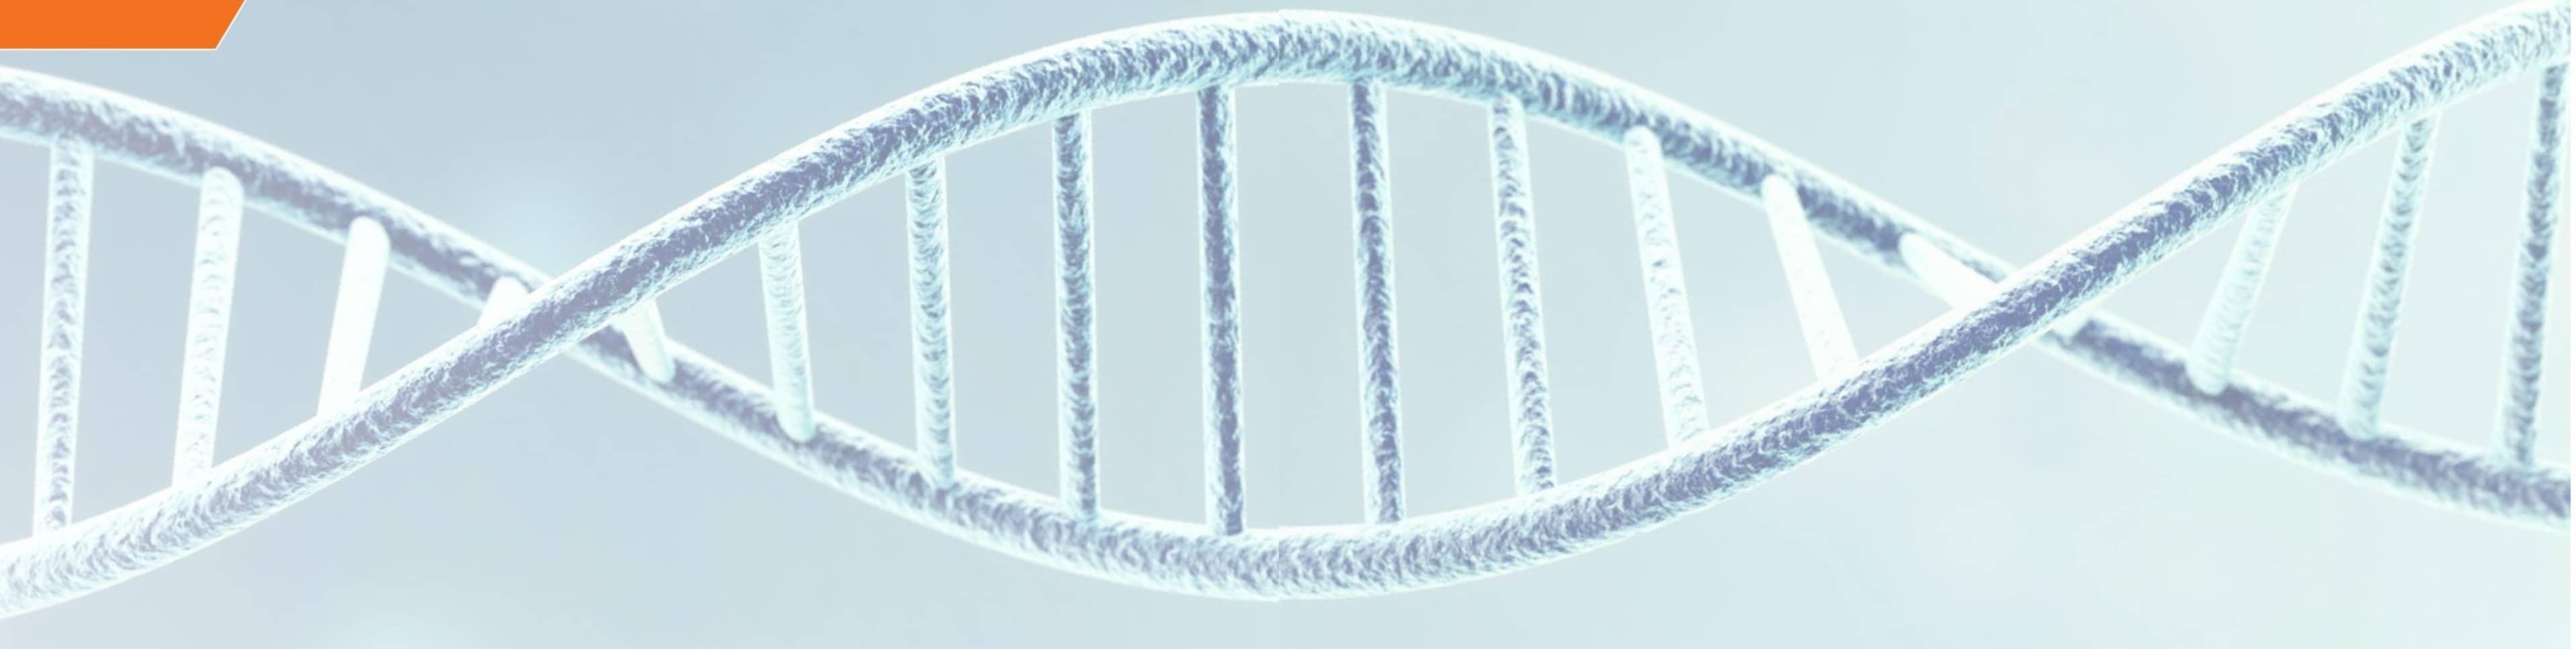 THE GENE Geme